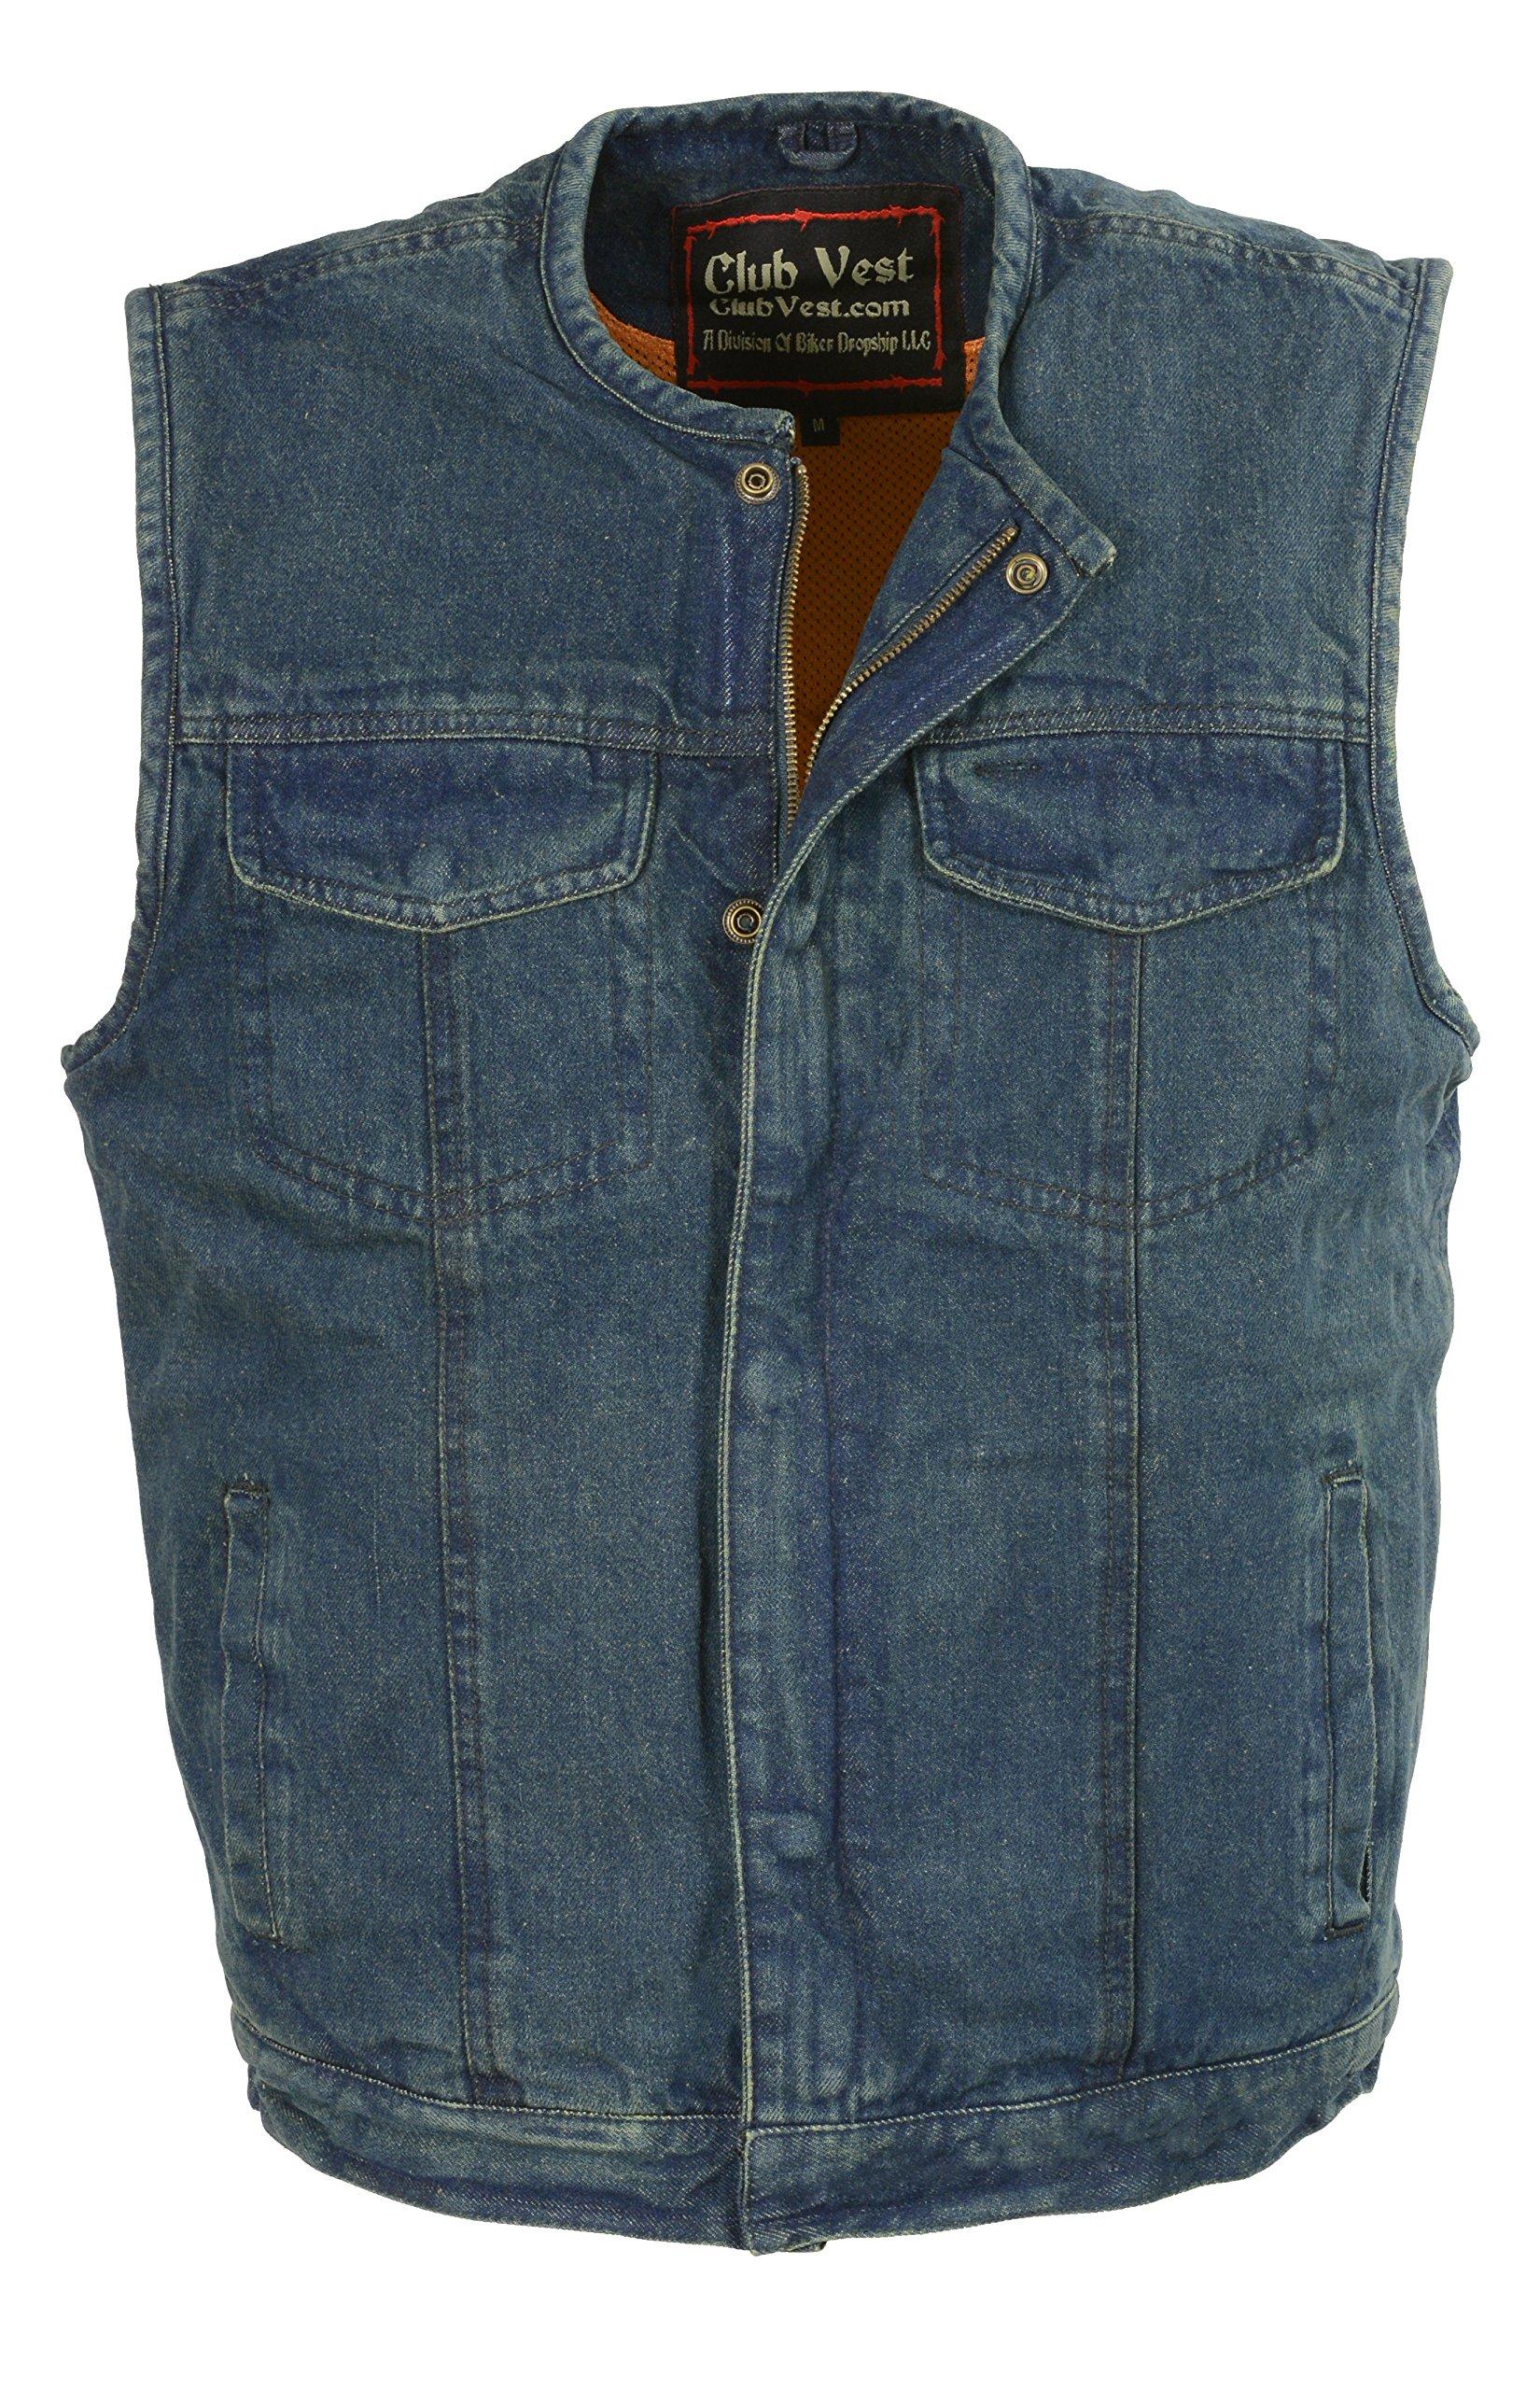 Club Vest-Men's Collarless Denim Club Vest w/Hidden Zipper (Blue, Large), 1 Pack by Club Vest